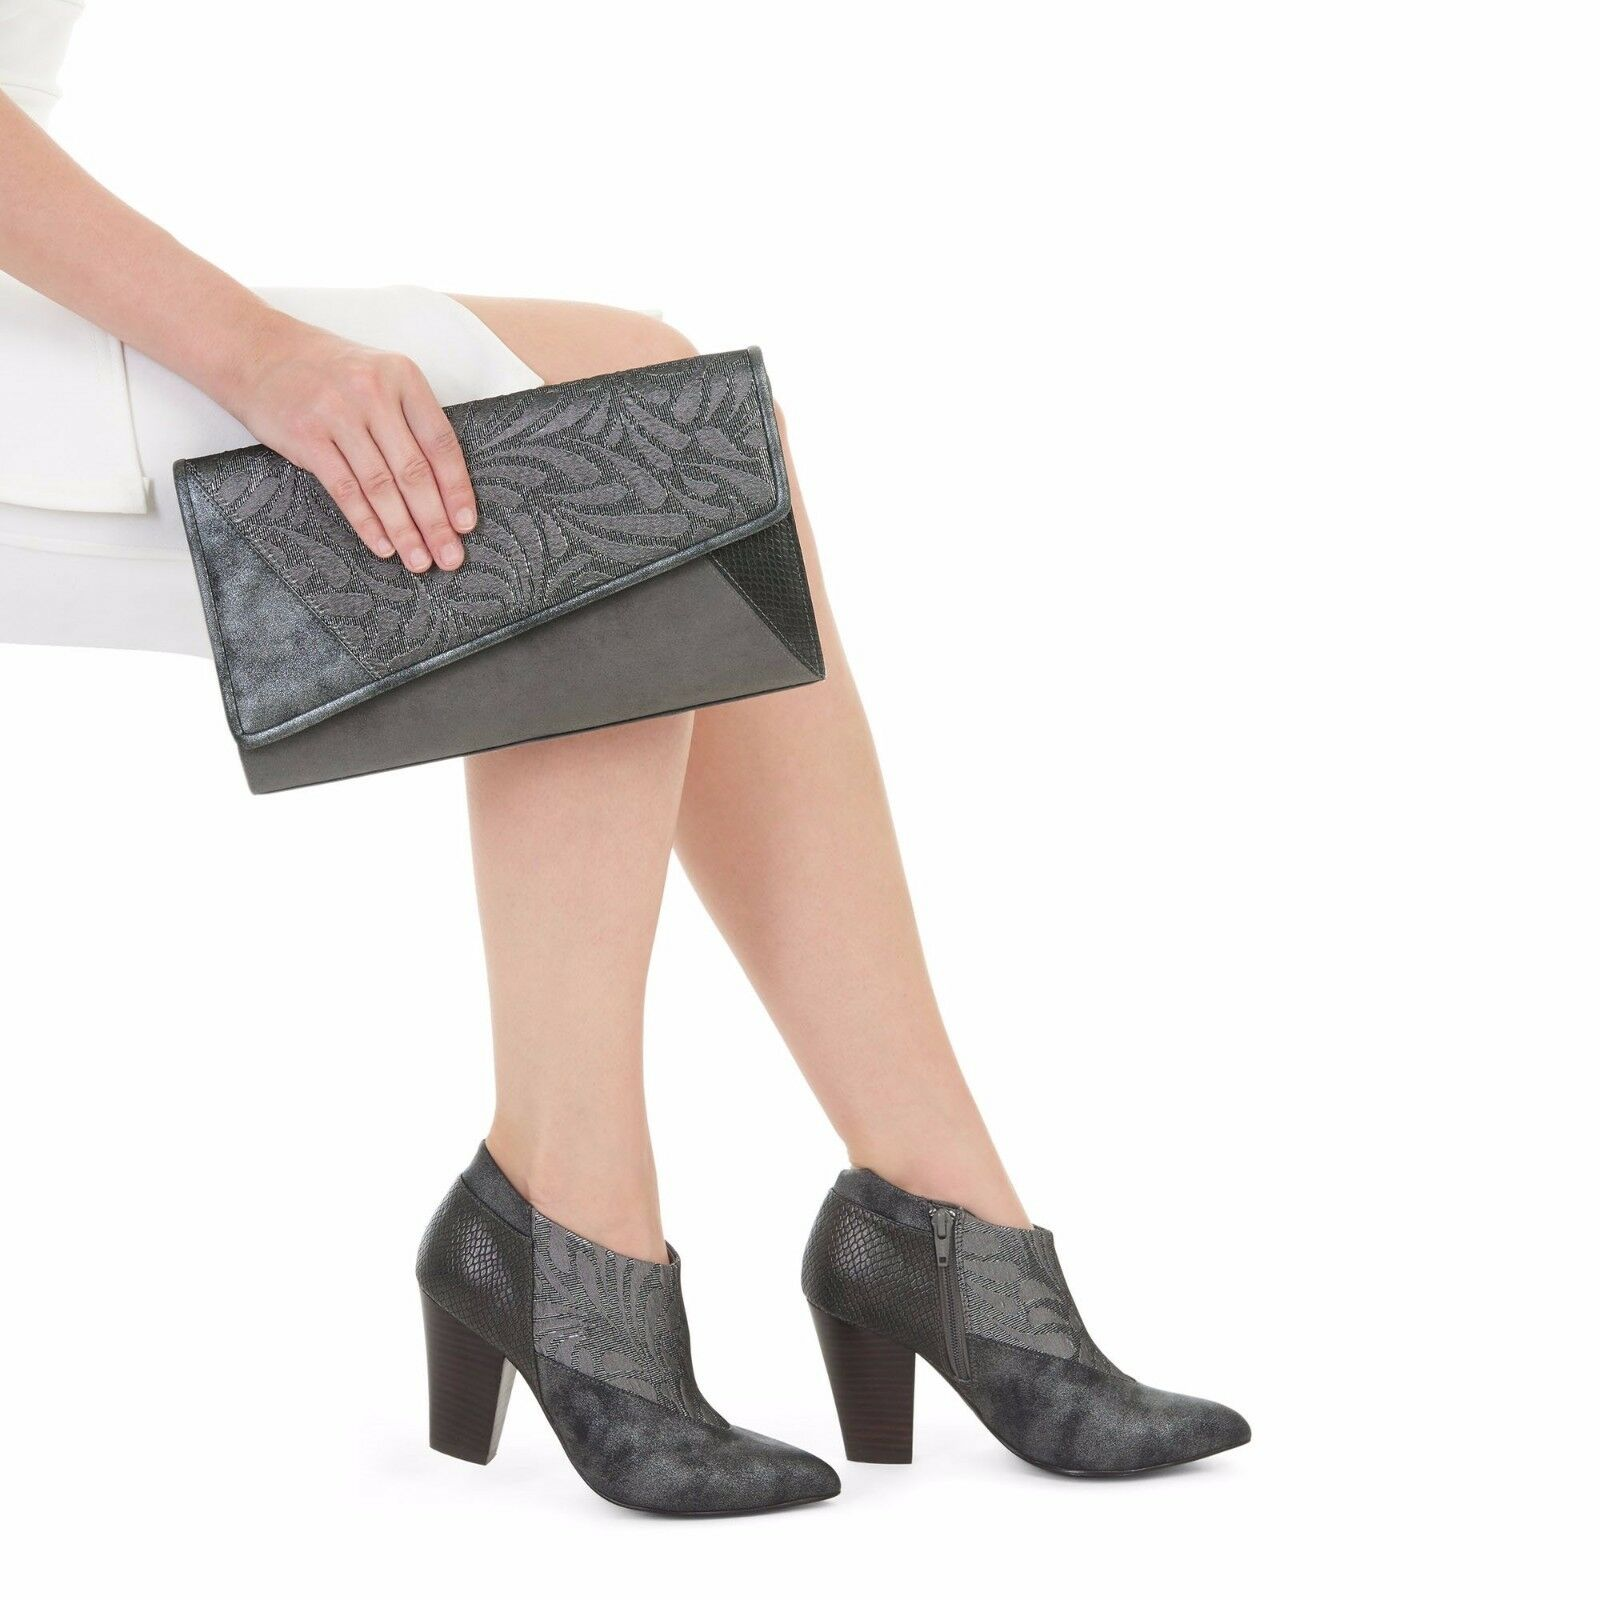 Damenschuhe Ruby Shoo Erika Pewter Ankle High